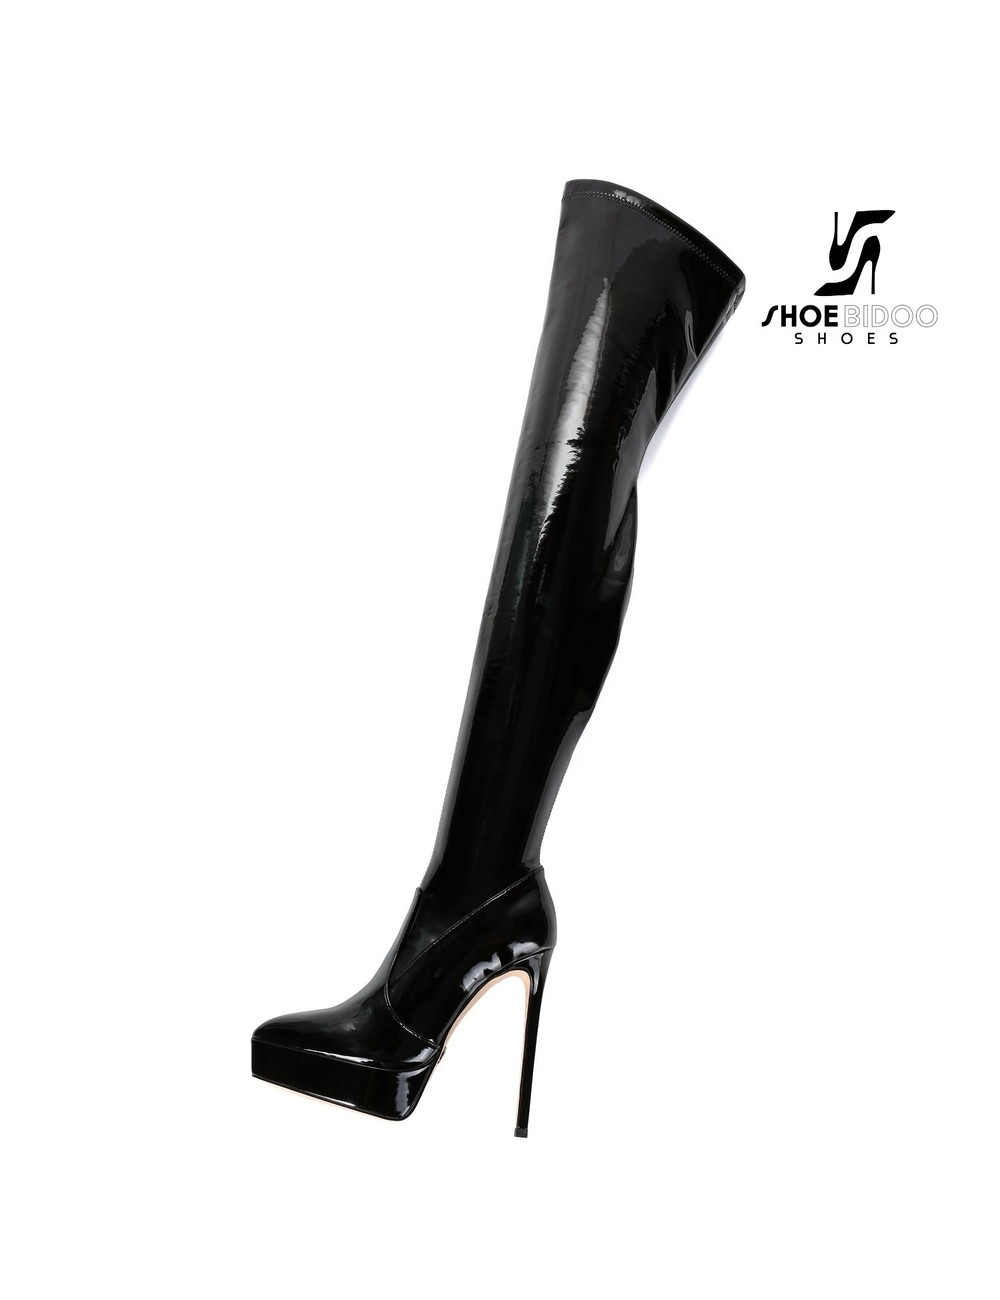 Giaro Giaro Platform Stiefel SPIRE in schwarz lack